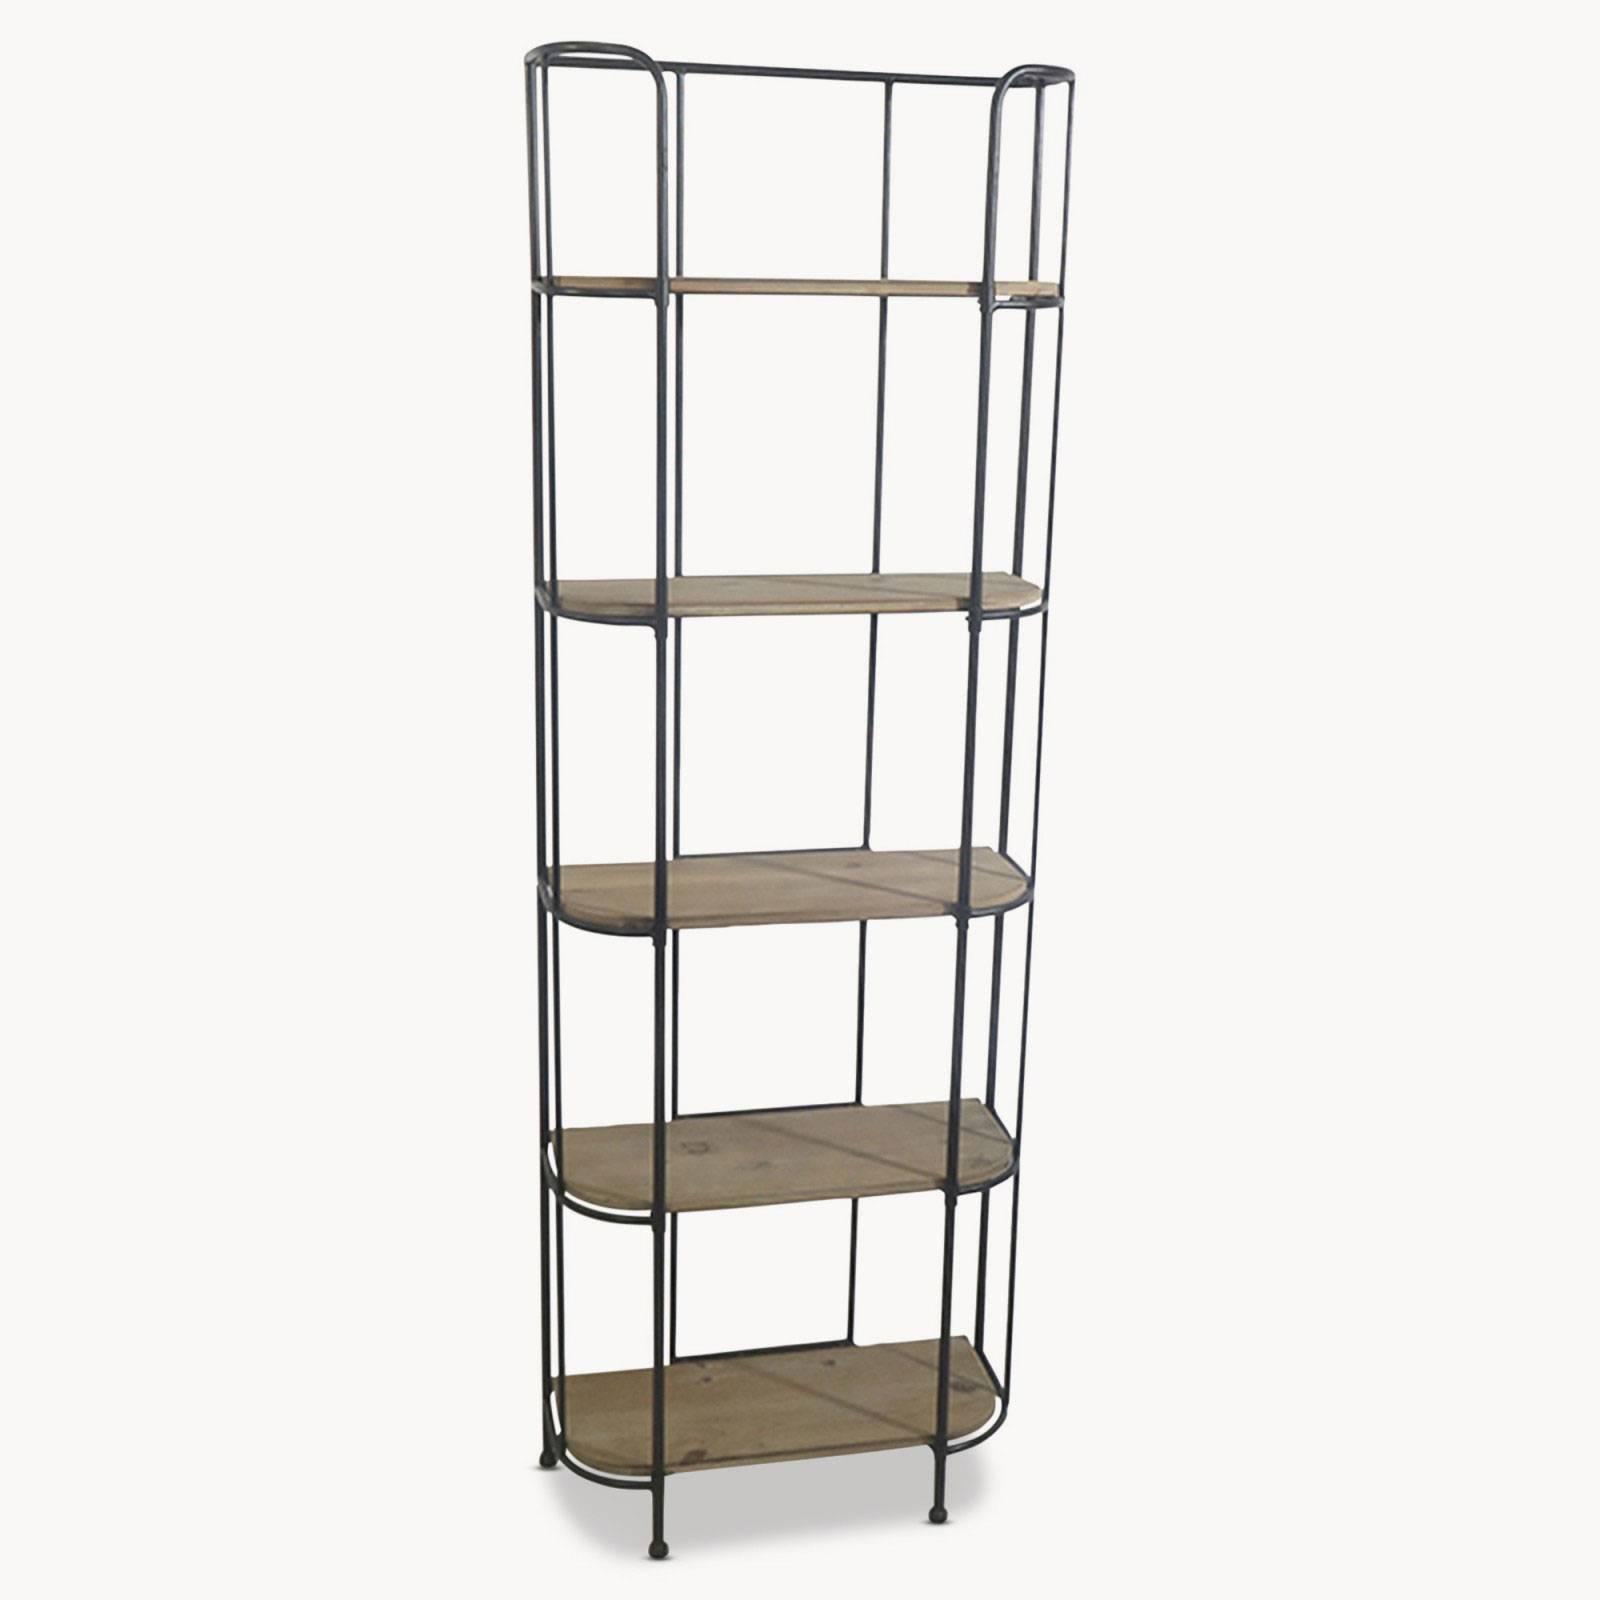 Bookshelf - Factory Style Shelving Unit thumbnails